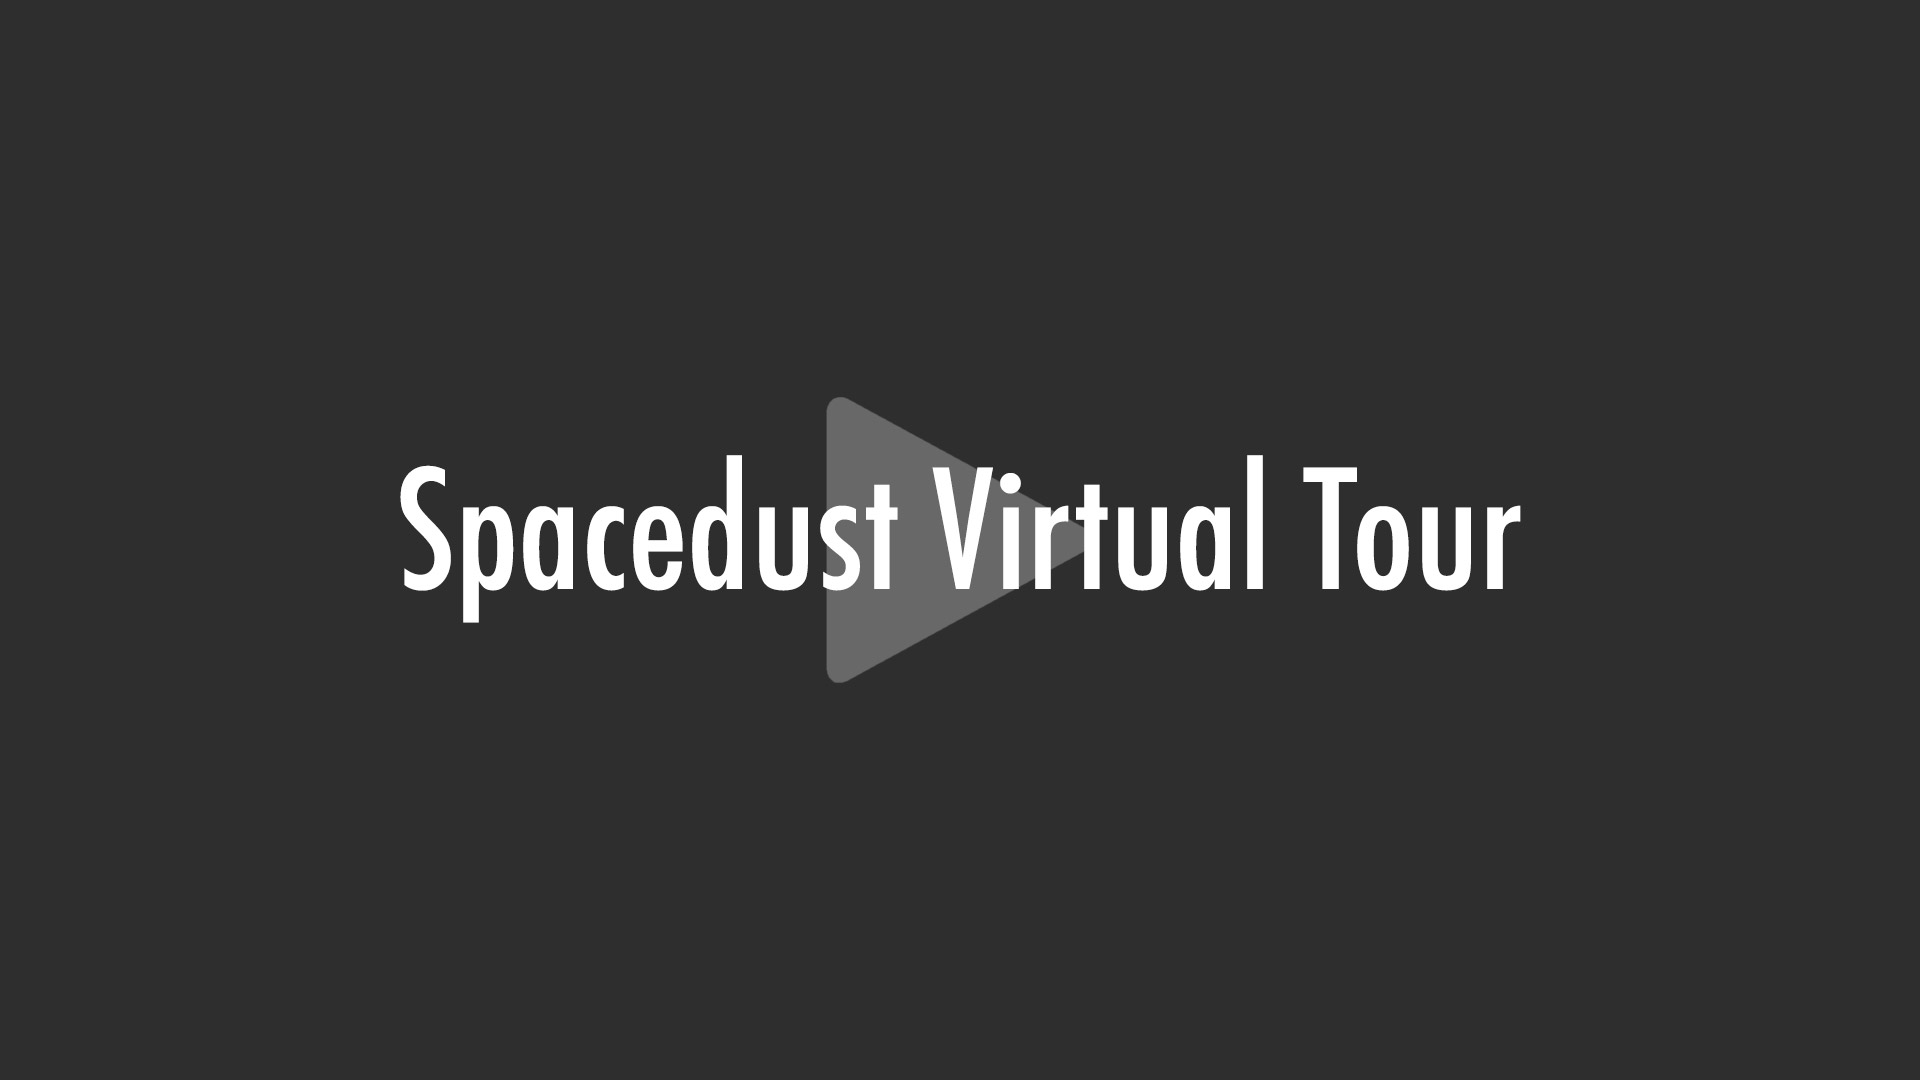 spacedustvirtualtour.jpg